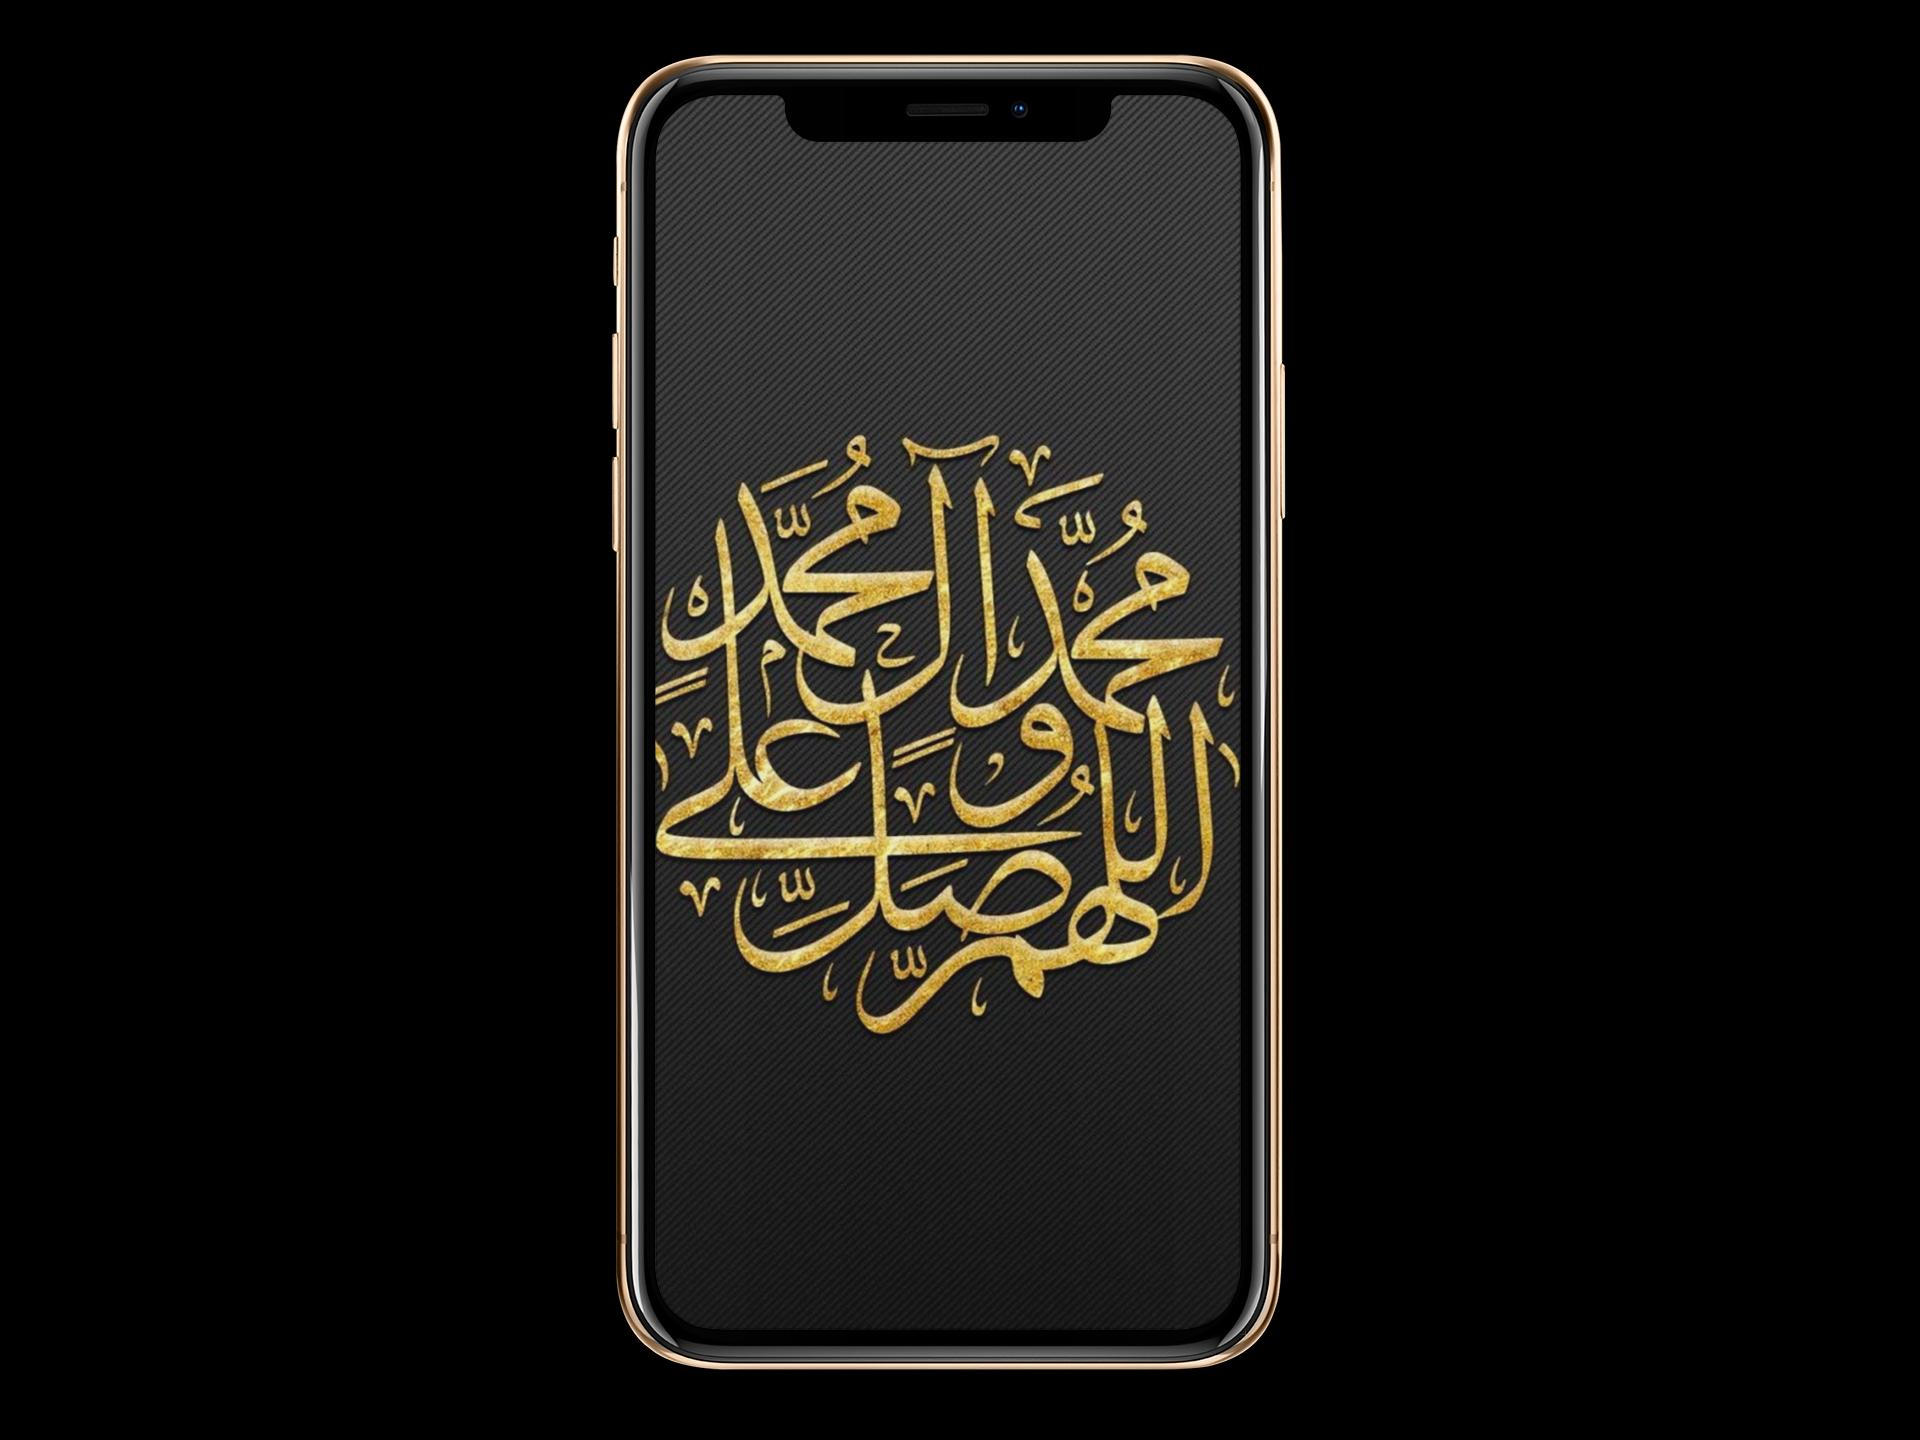 Islamic Wallpaper Hd Download Islamic Wallpaper Hd For Mobile